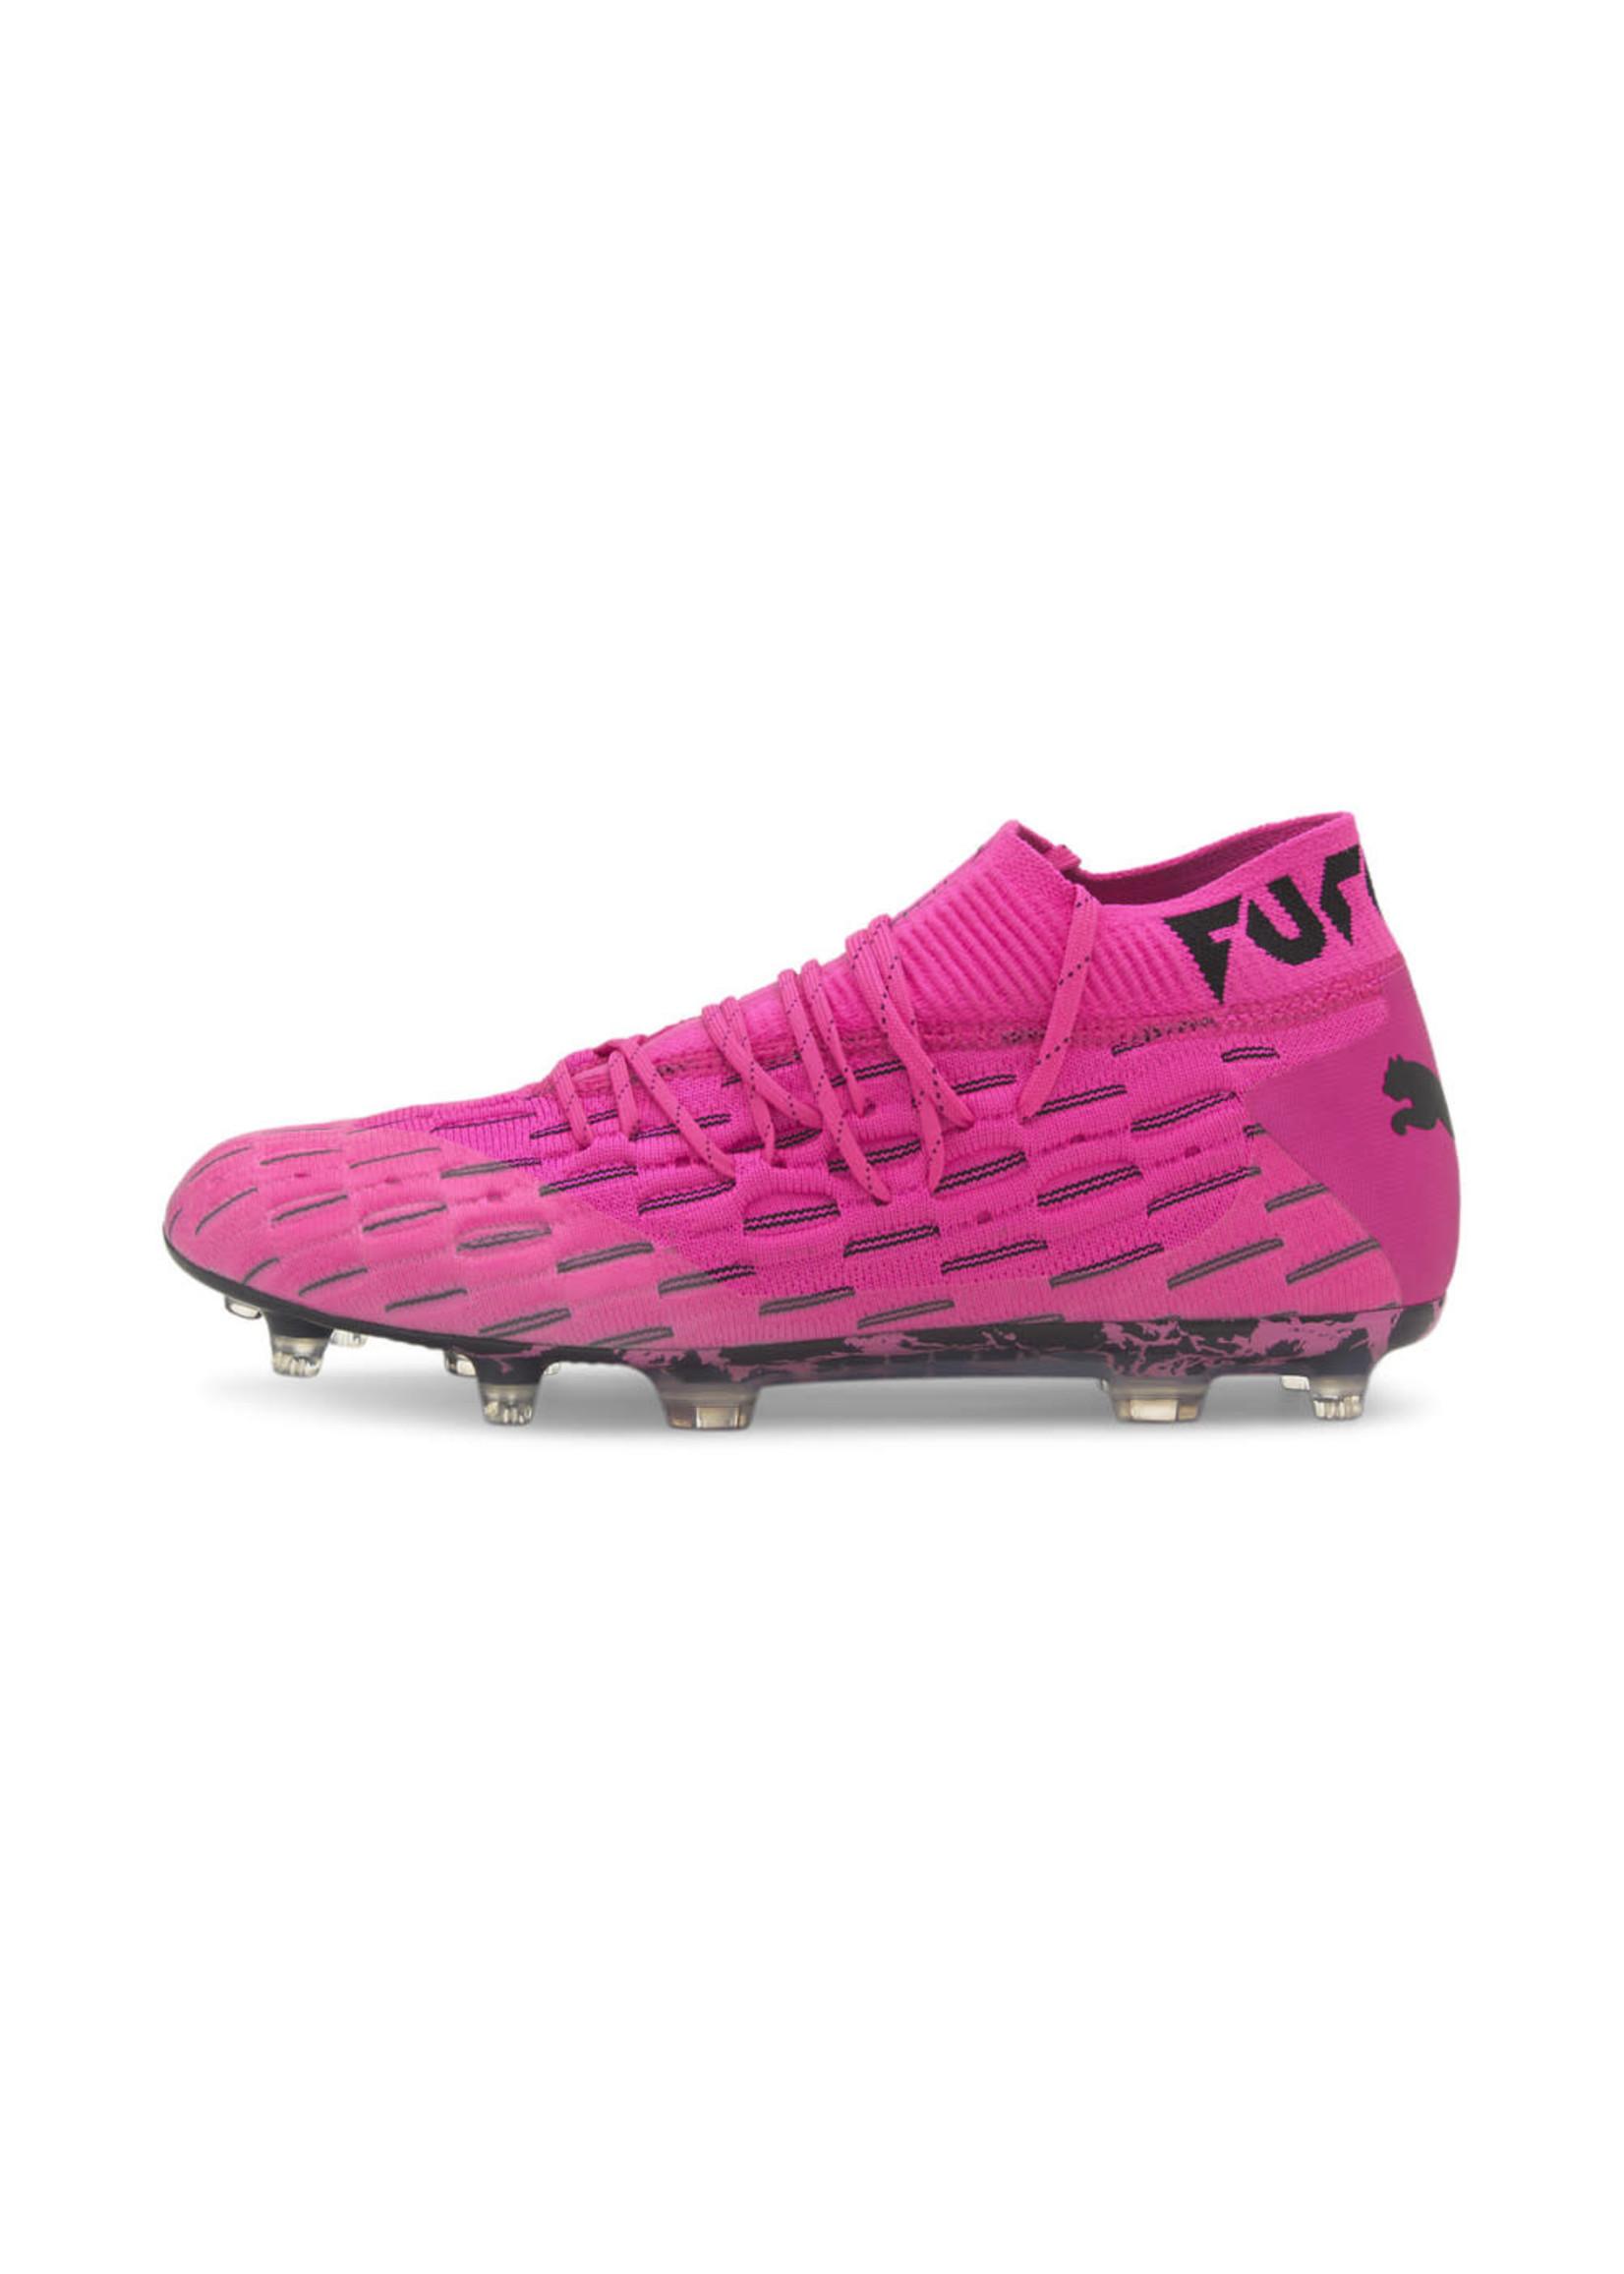 Puma Future 6.1 Netfit FG - Pink/Black